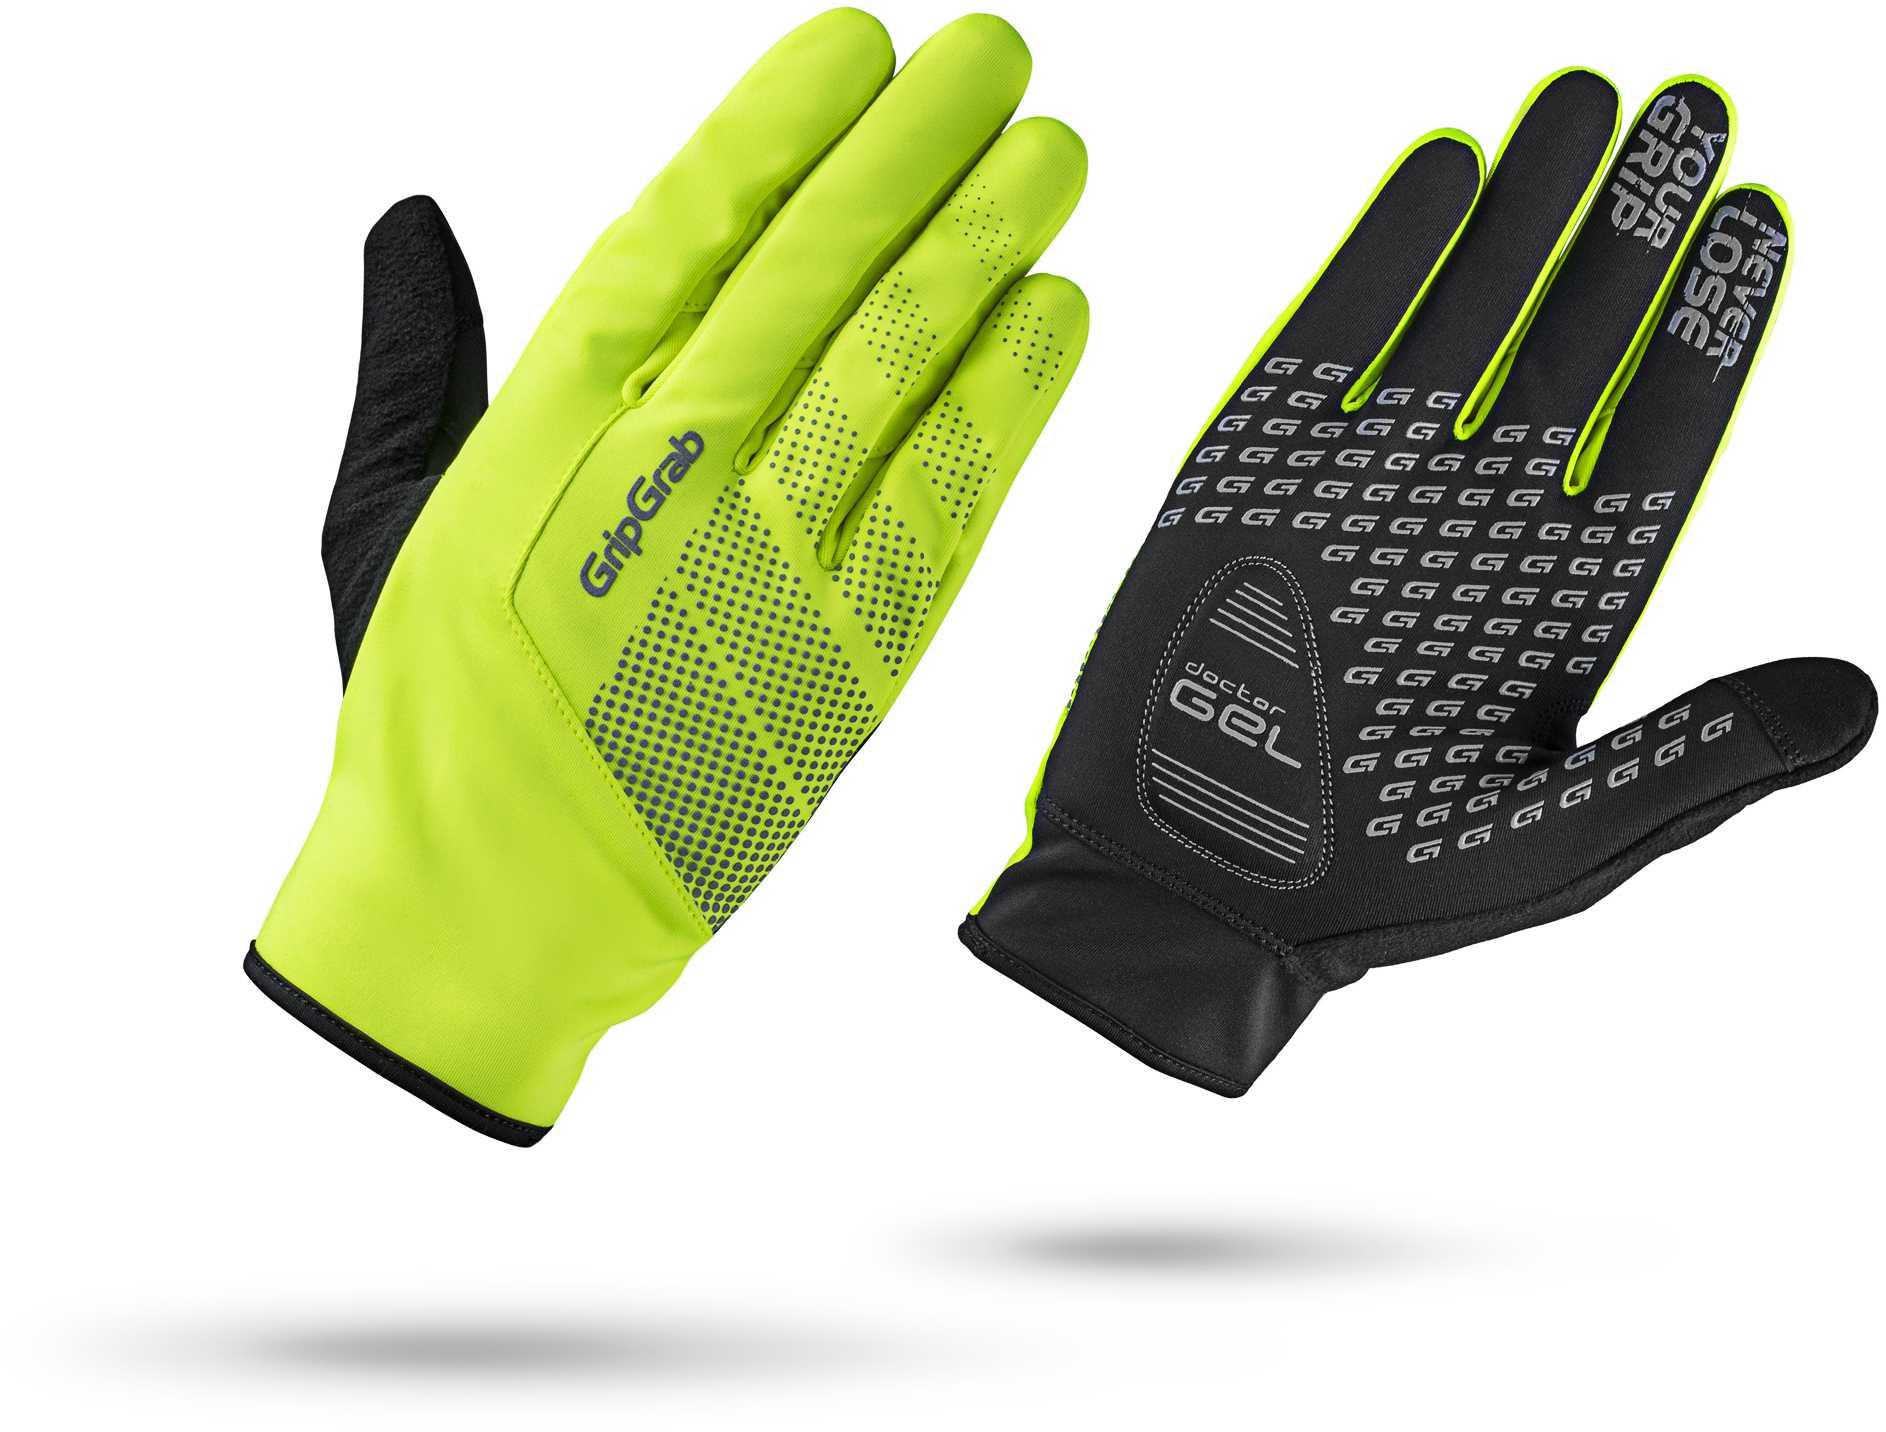 Handsker GripGrab Ride Windproof Midseason Hi-Vis gul | Handsker